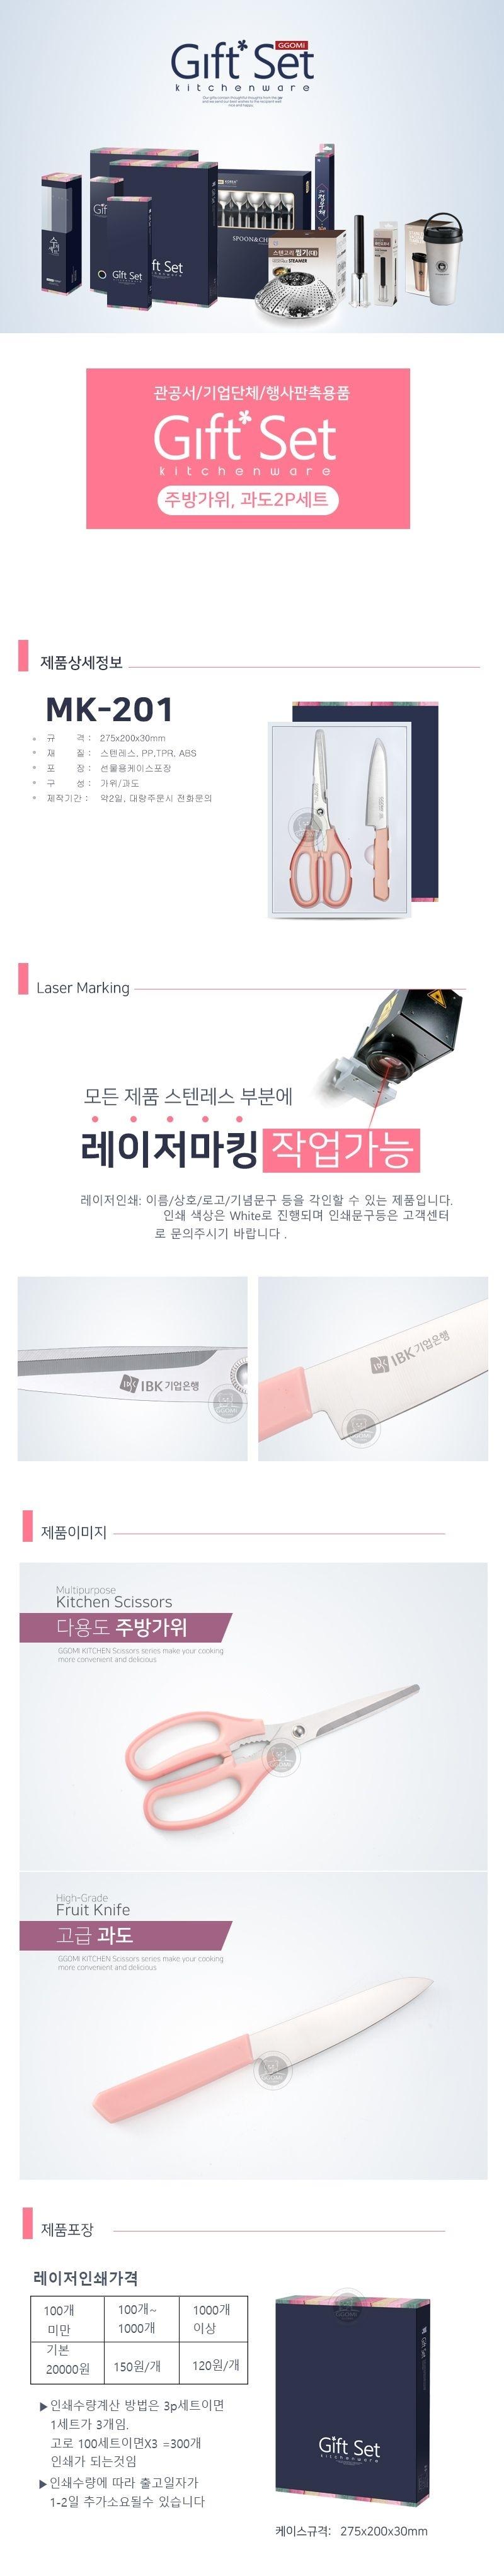 Giftset kéo, dao gọt hoa quả  MK 201( Set dao + kéo)